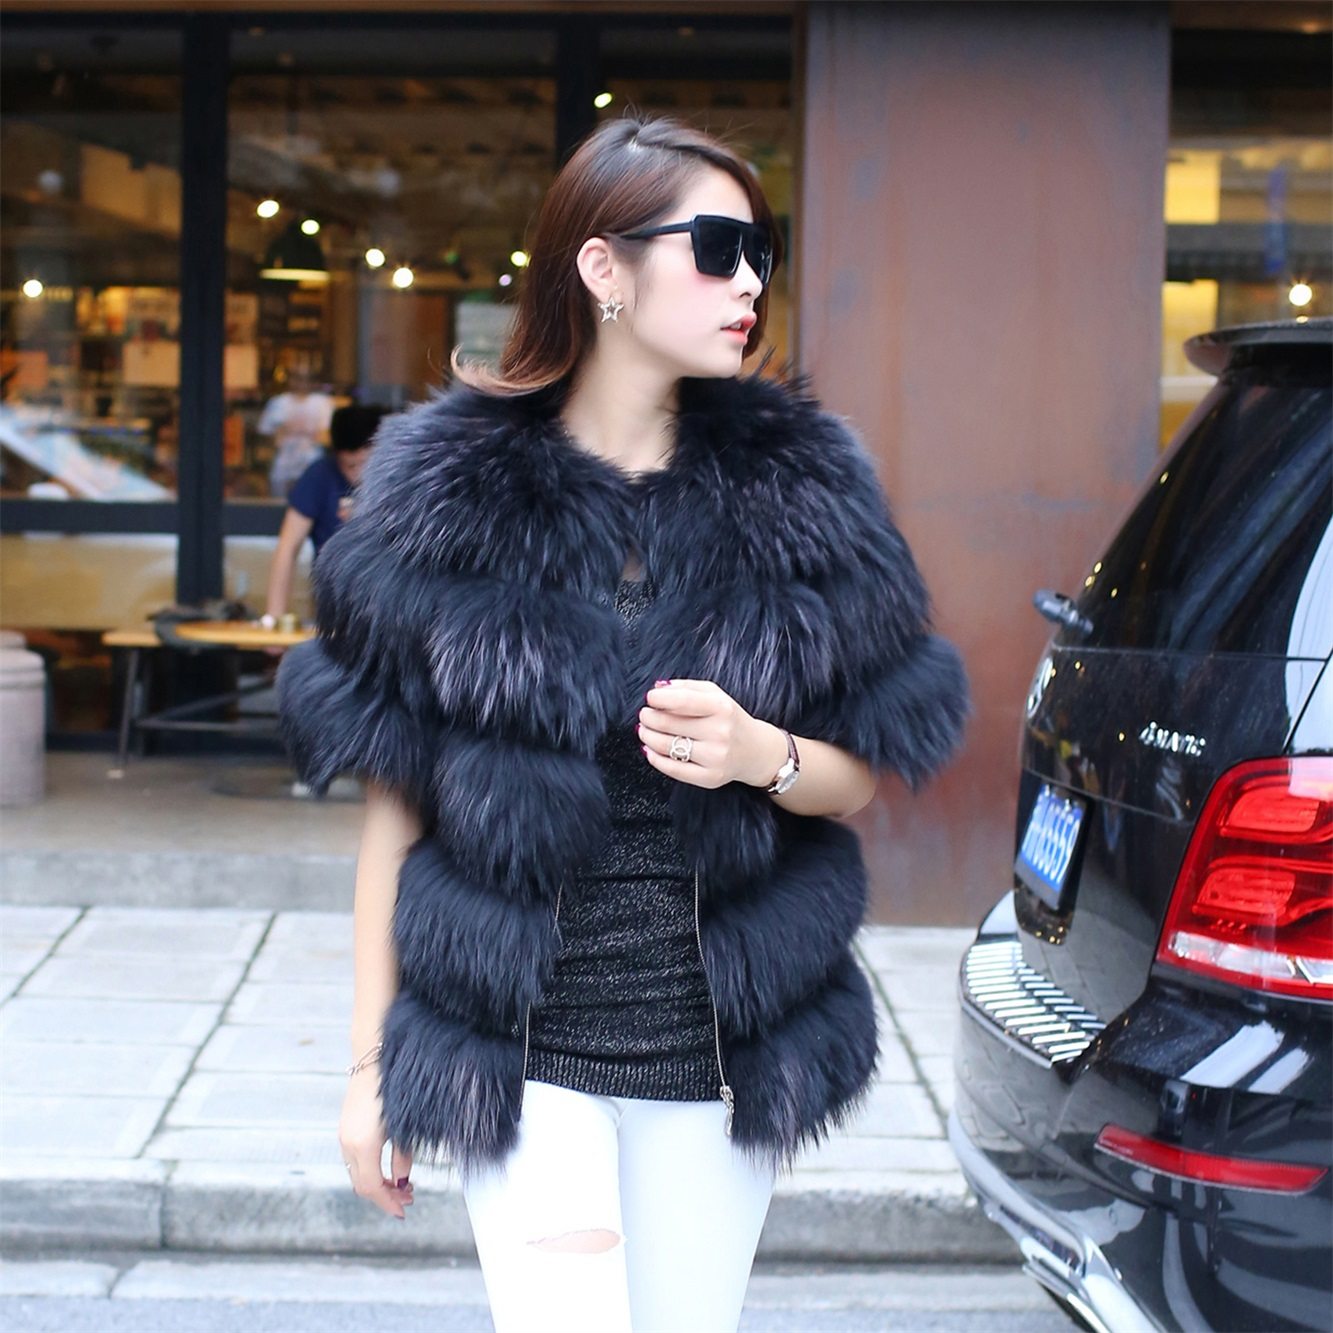 Now Special Offer Standard Triple Breasted Fur Half Coat Fox Raccoon Fur Vest Jacket New Korea European Control Station